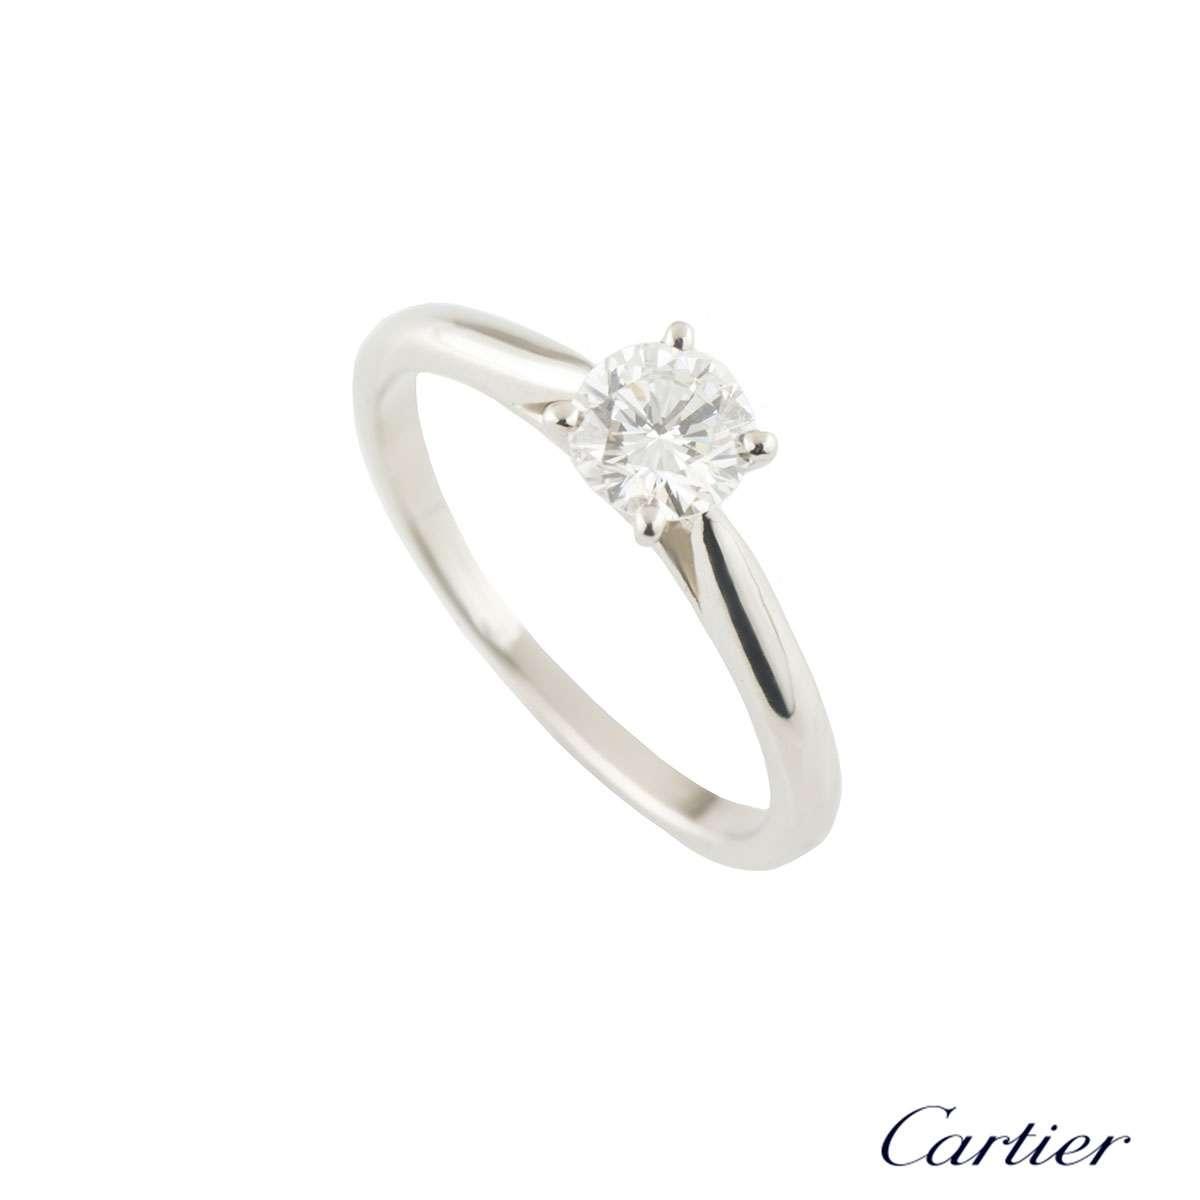 Cartier Solitaire 1895 Diamond Ring 0.42ct F/VVS2